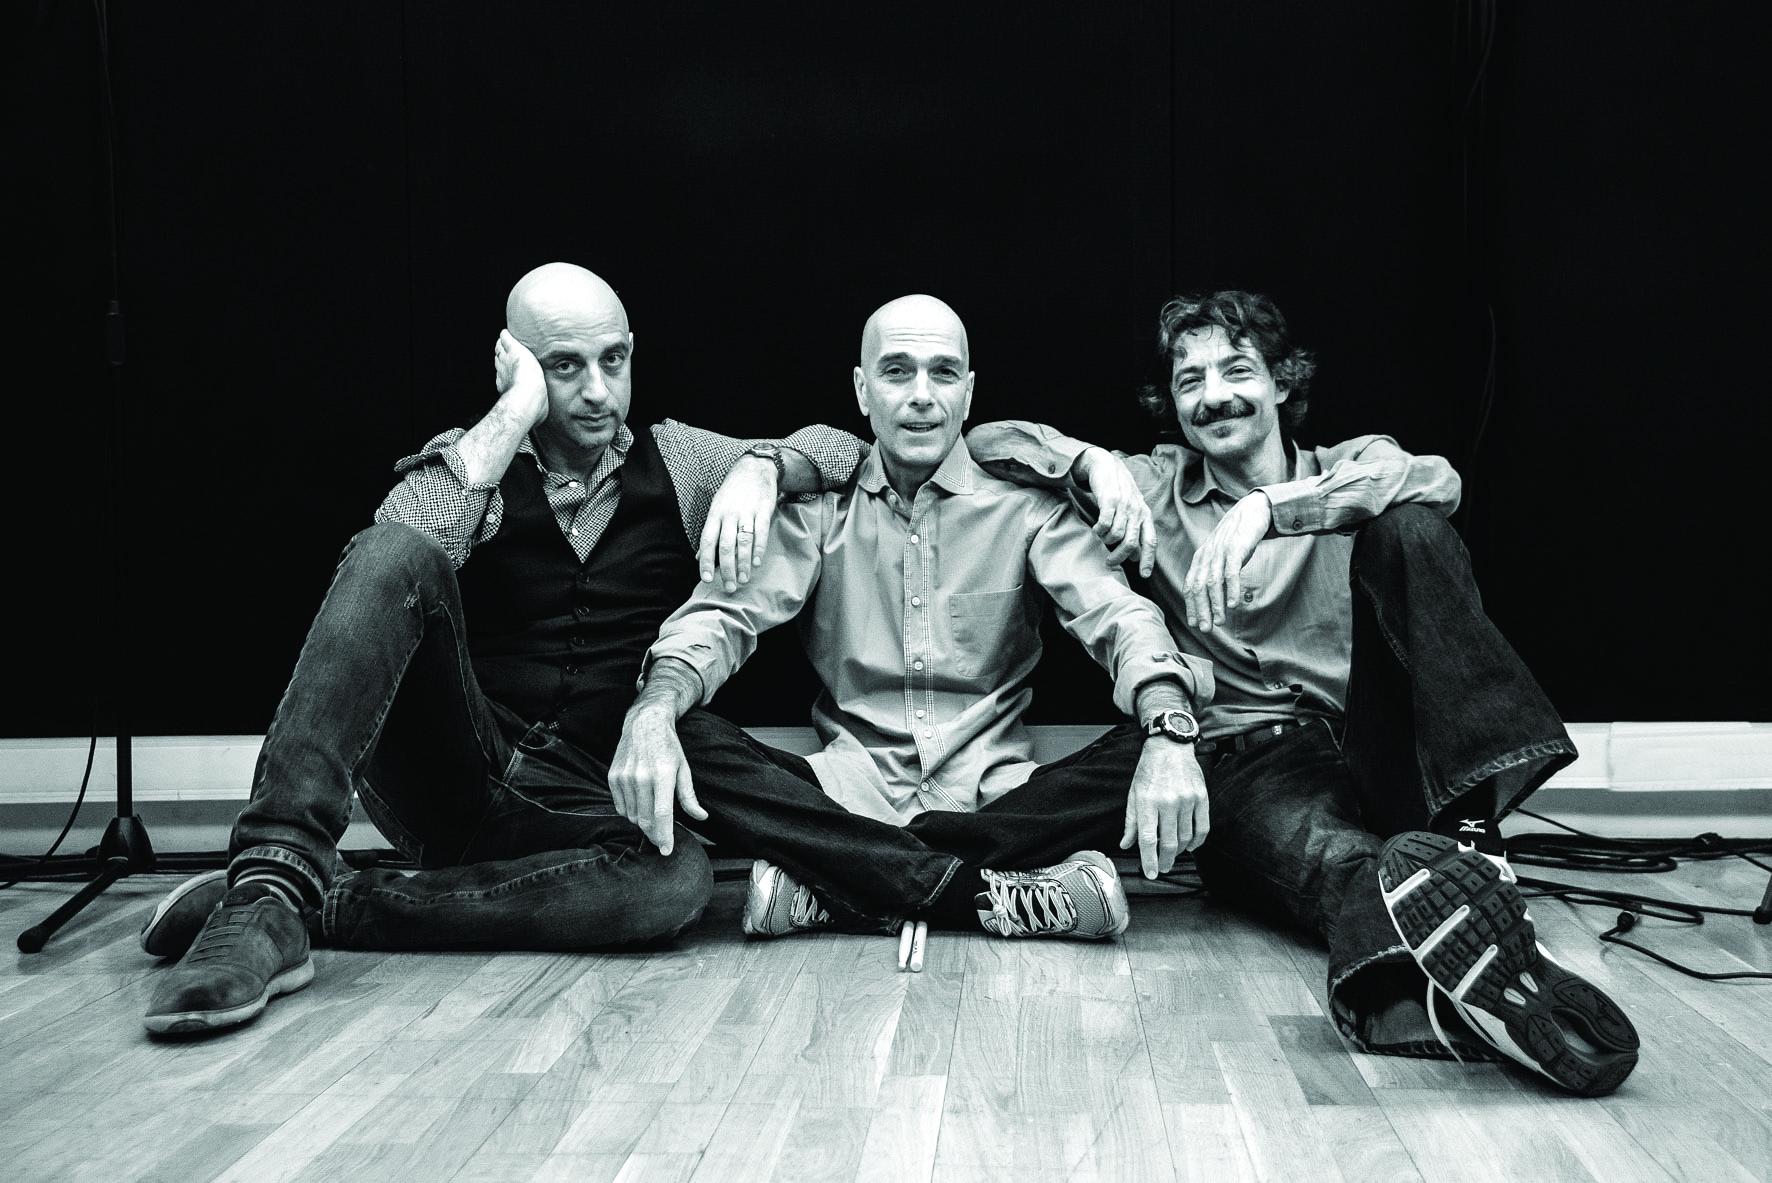 Trio Bobo 22/3/16